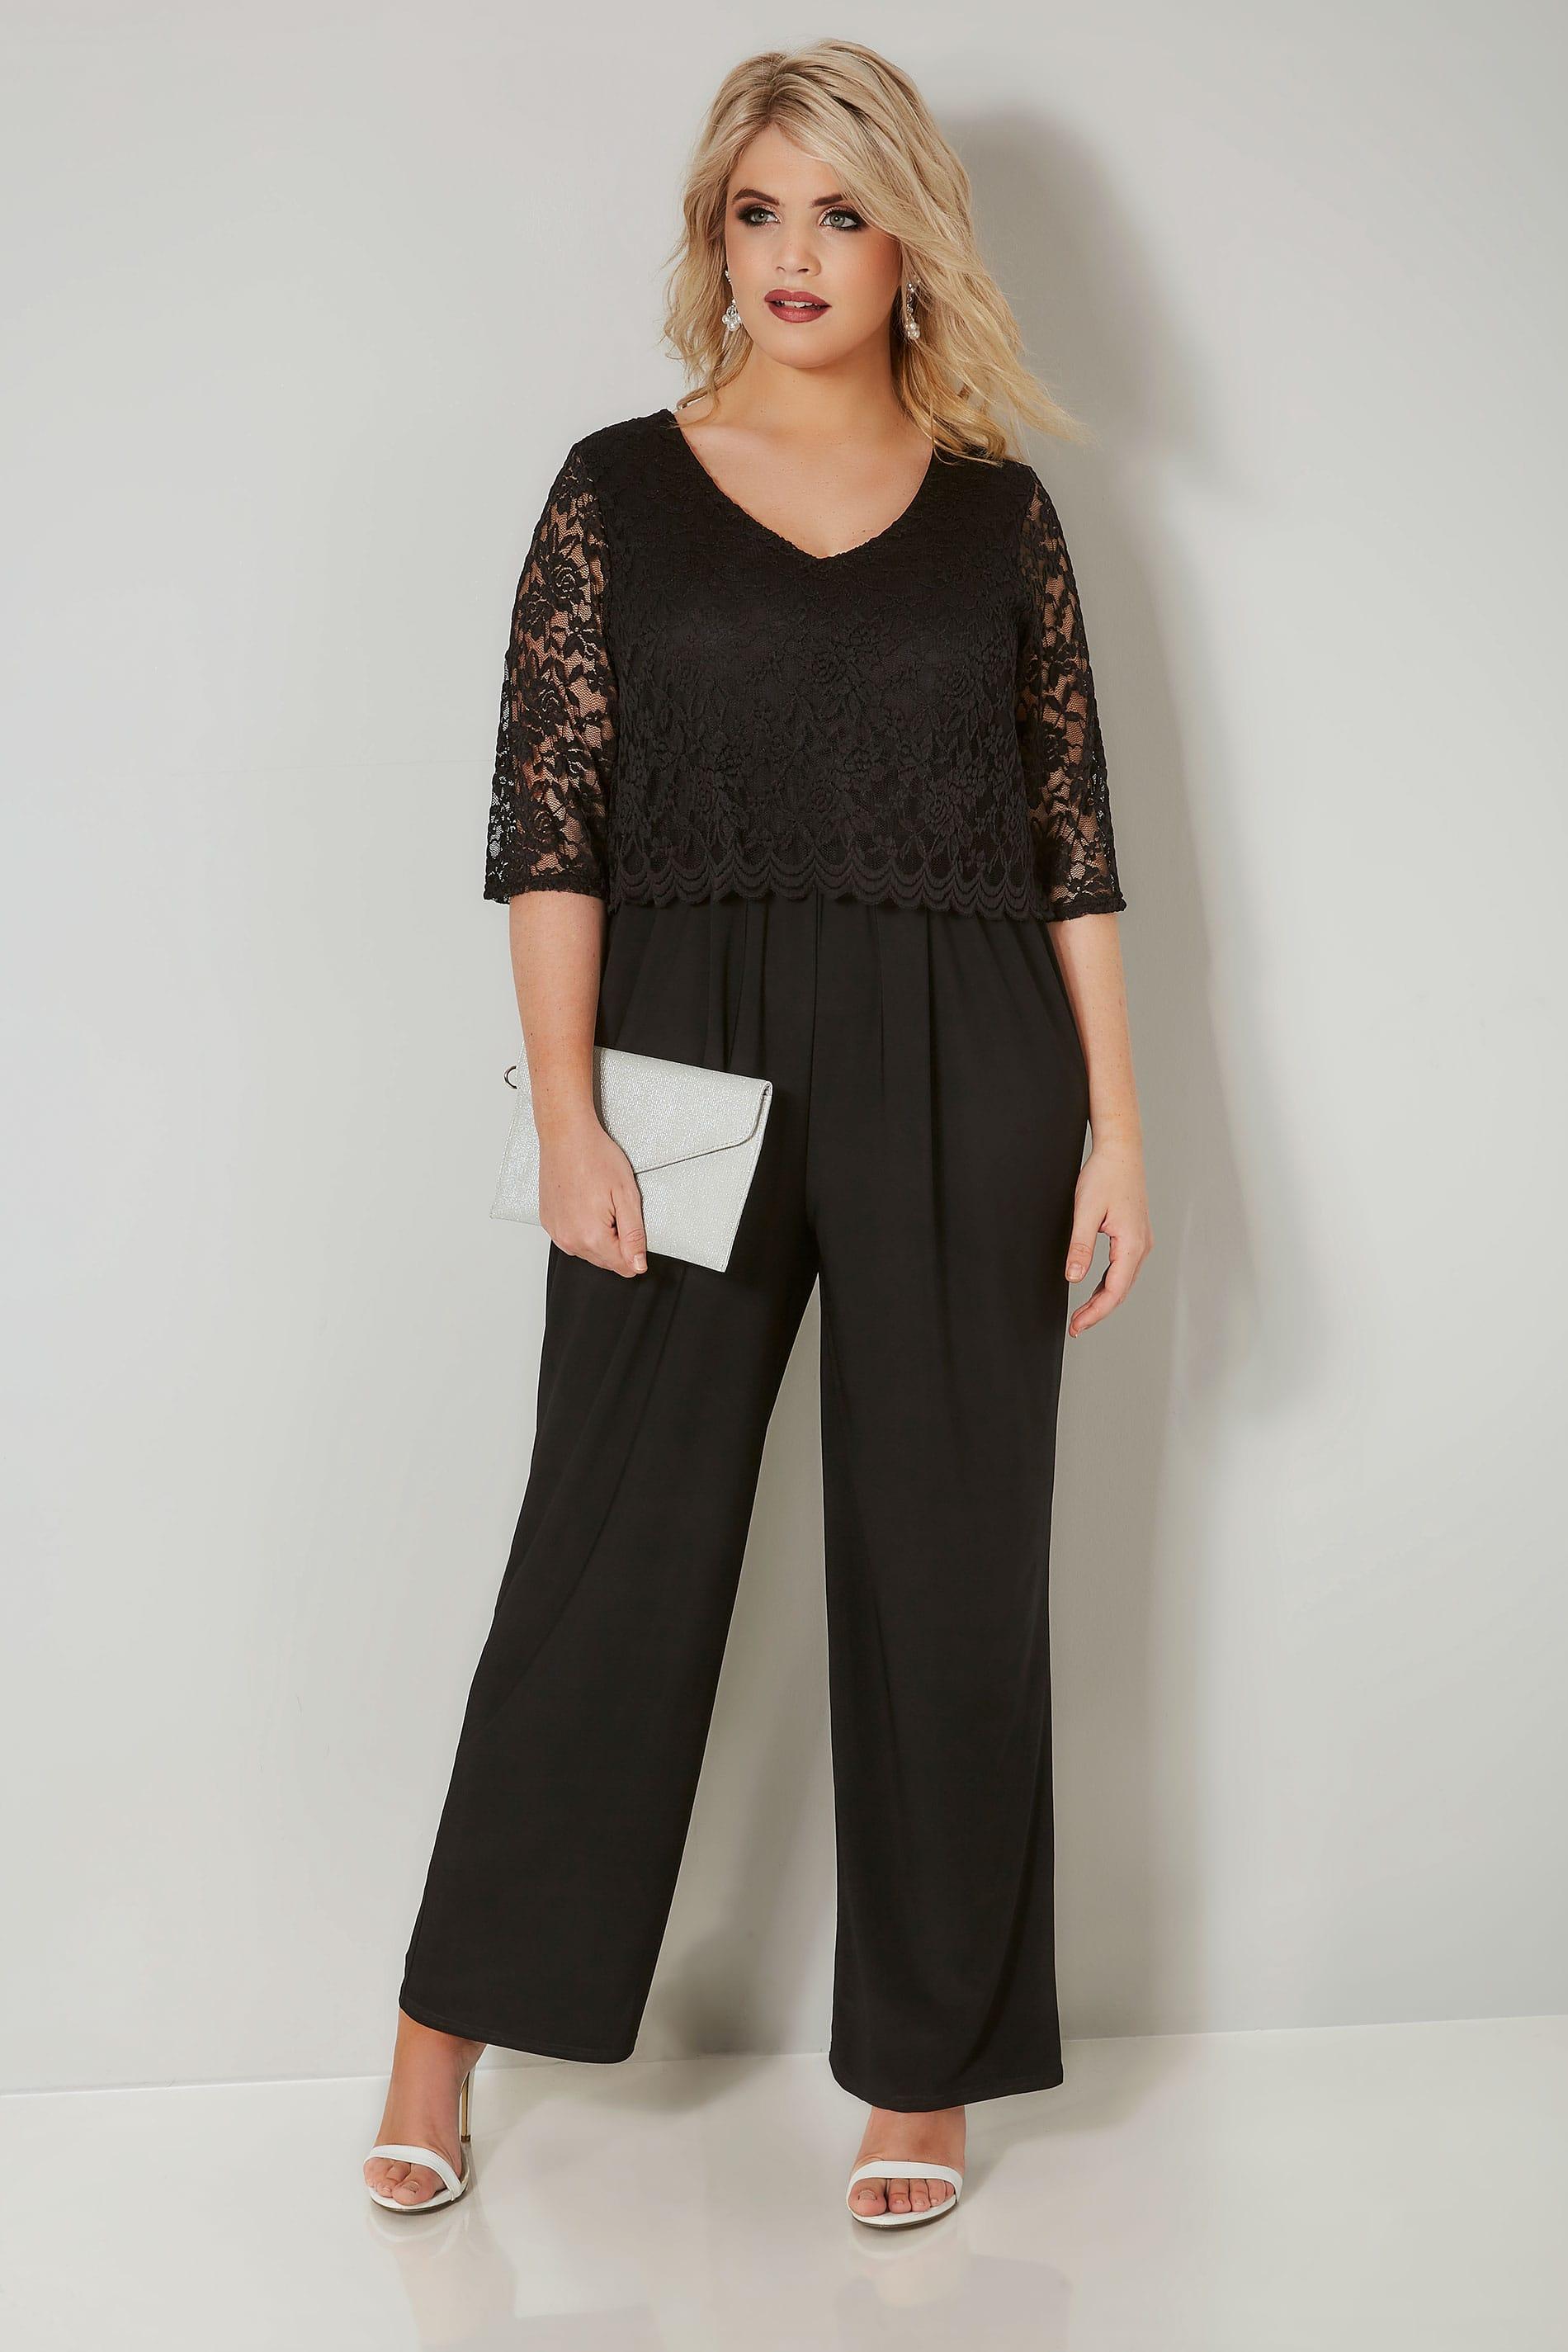 sale retailer 81c20 c85b0 YOURS LONDON Schwarzer Jumpsuit mit Spitze